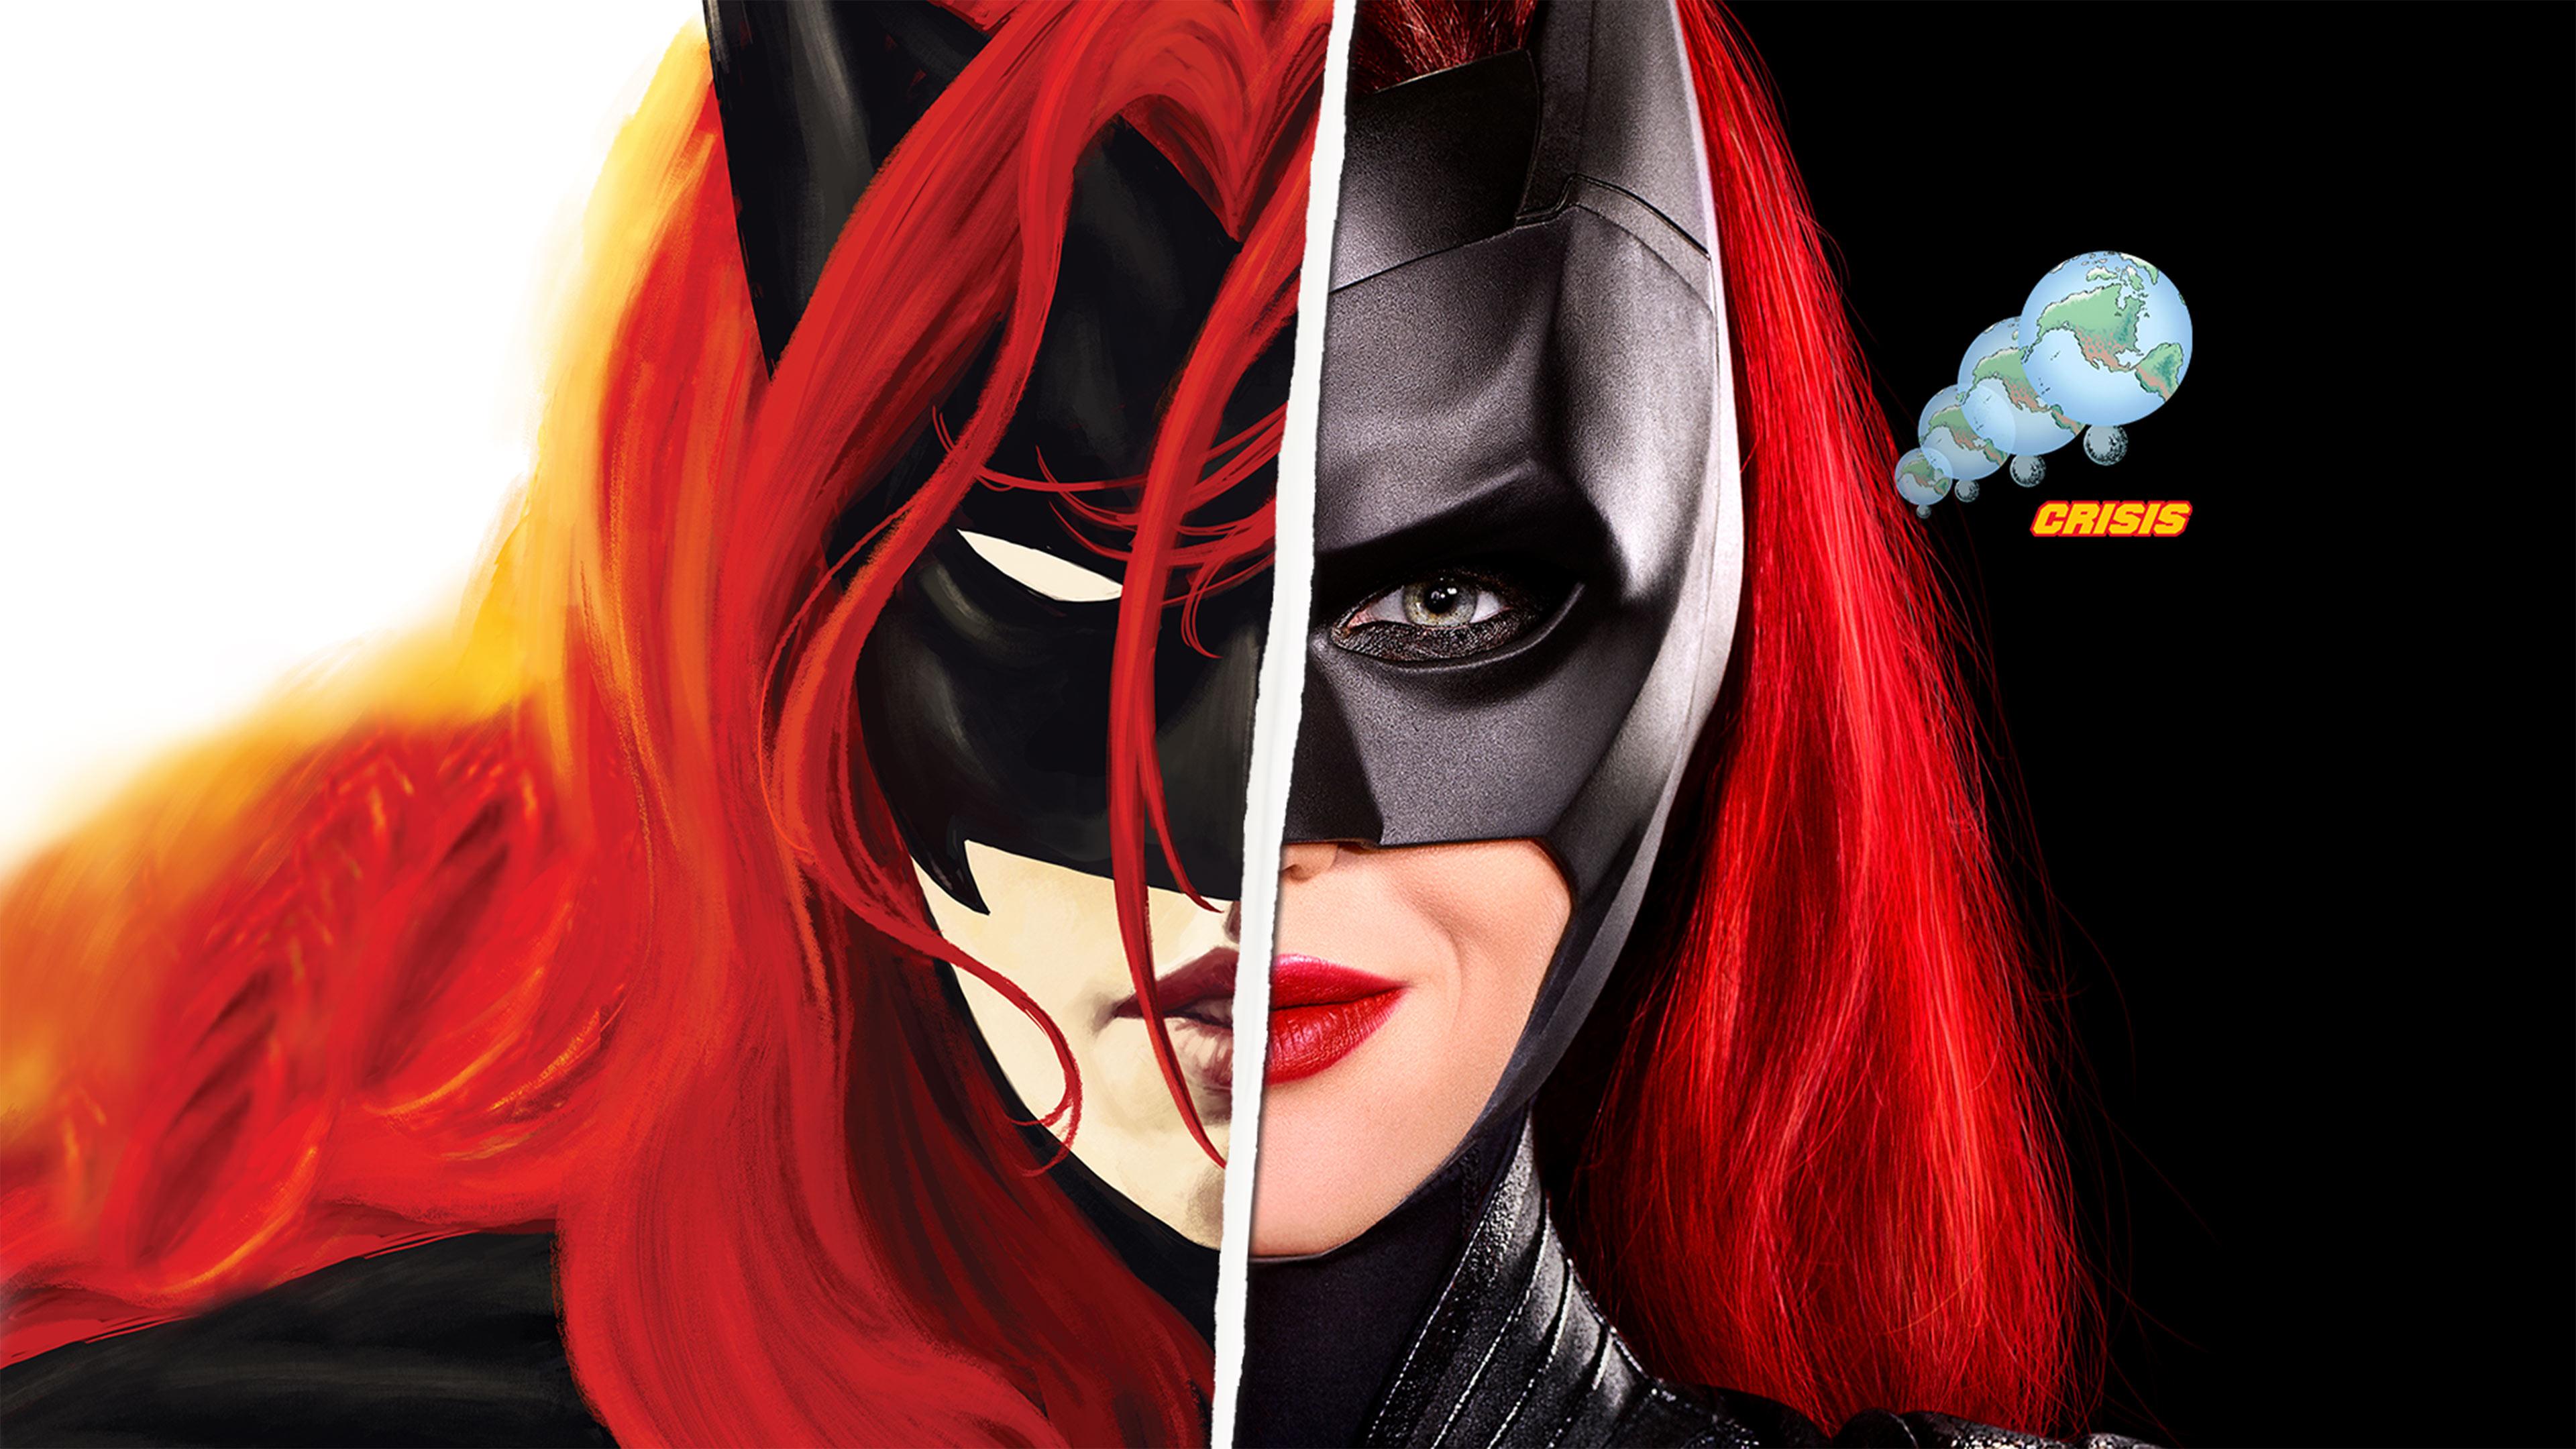 crisis_cwcomicbookroots_batwoman_news_hero-c_v1_191122.jpg